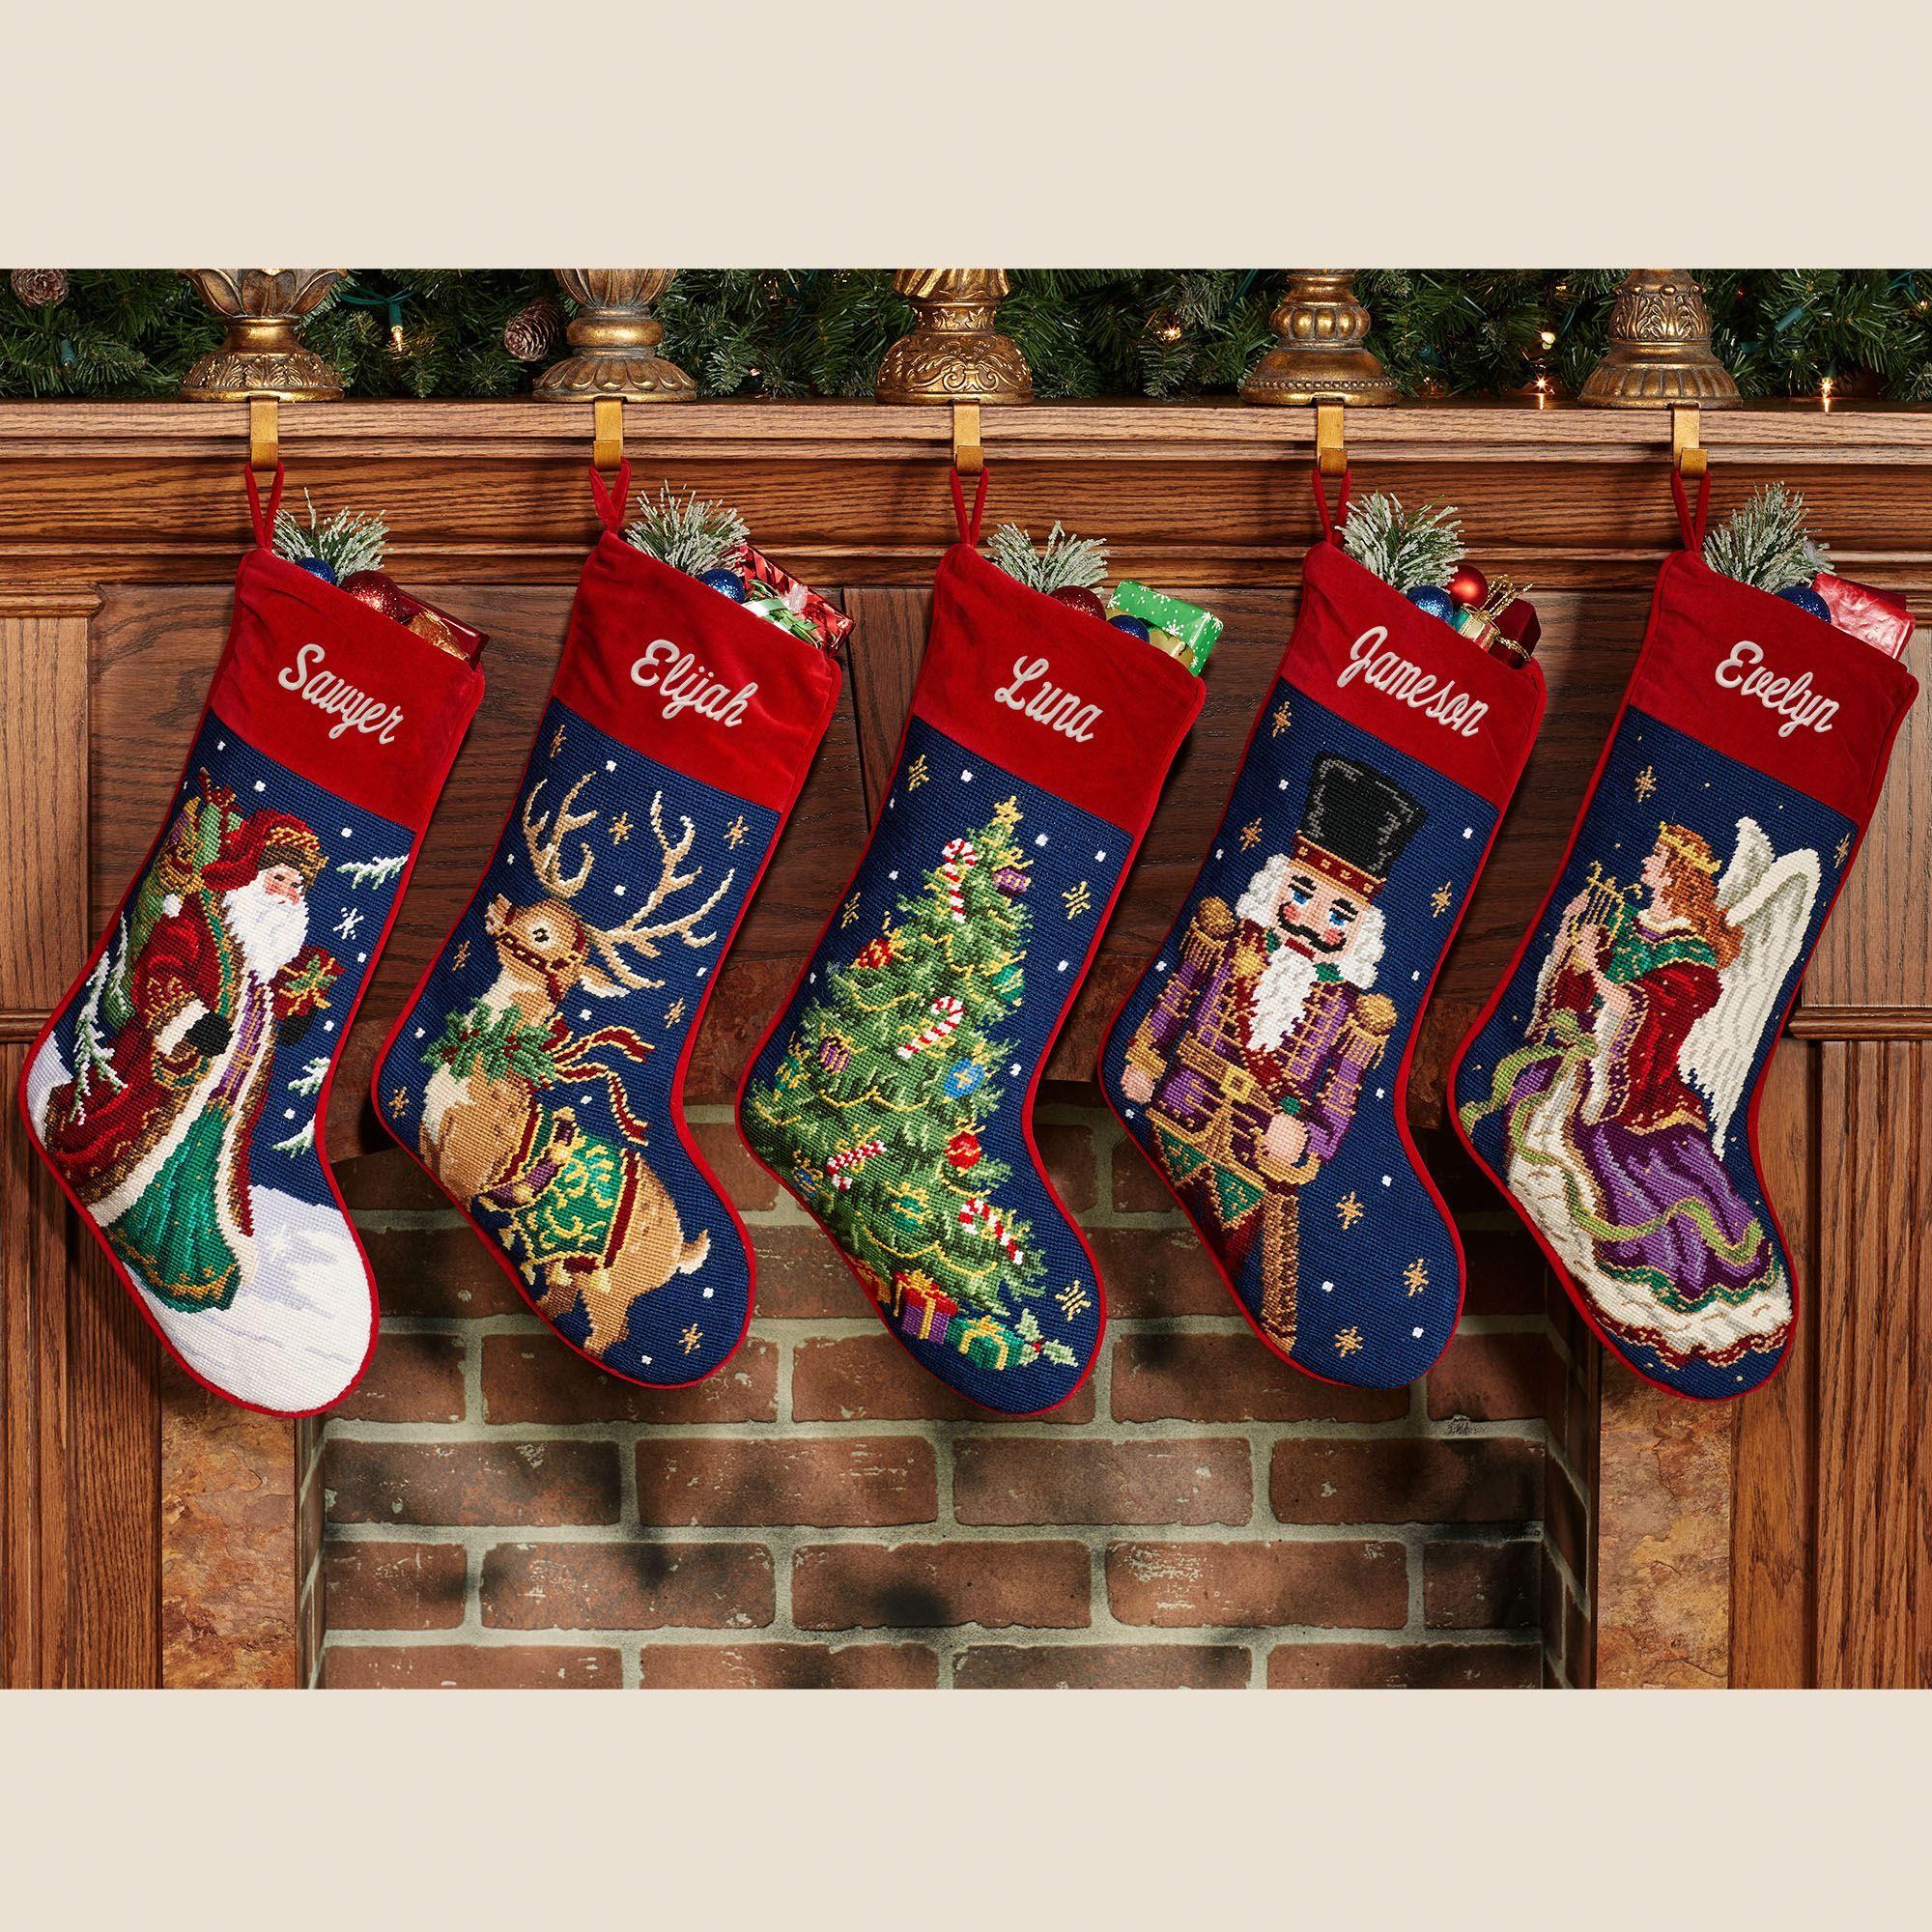 Needlepoint Christmas Stockings.Charming Needlepoint Christmas Stockings